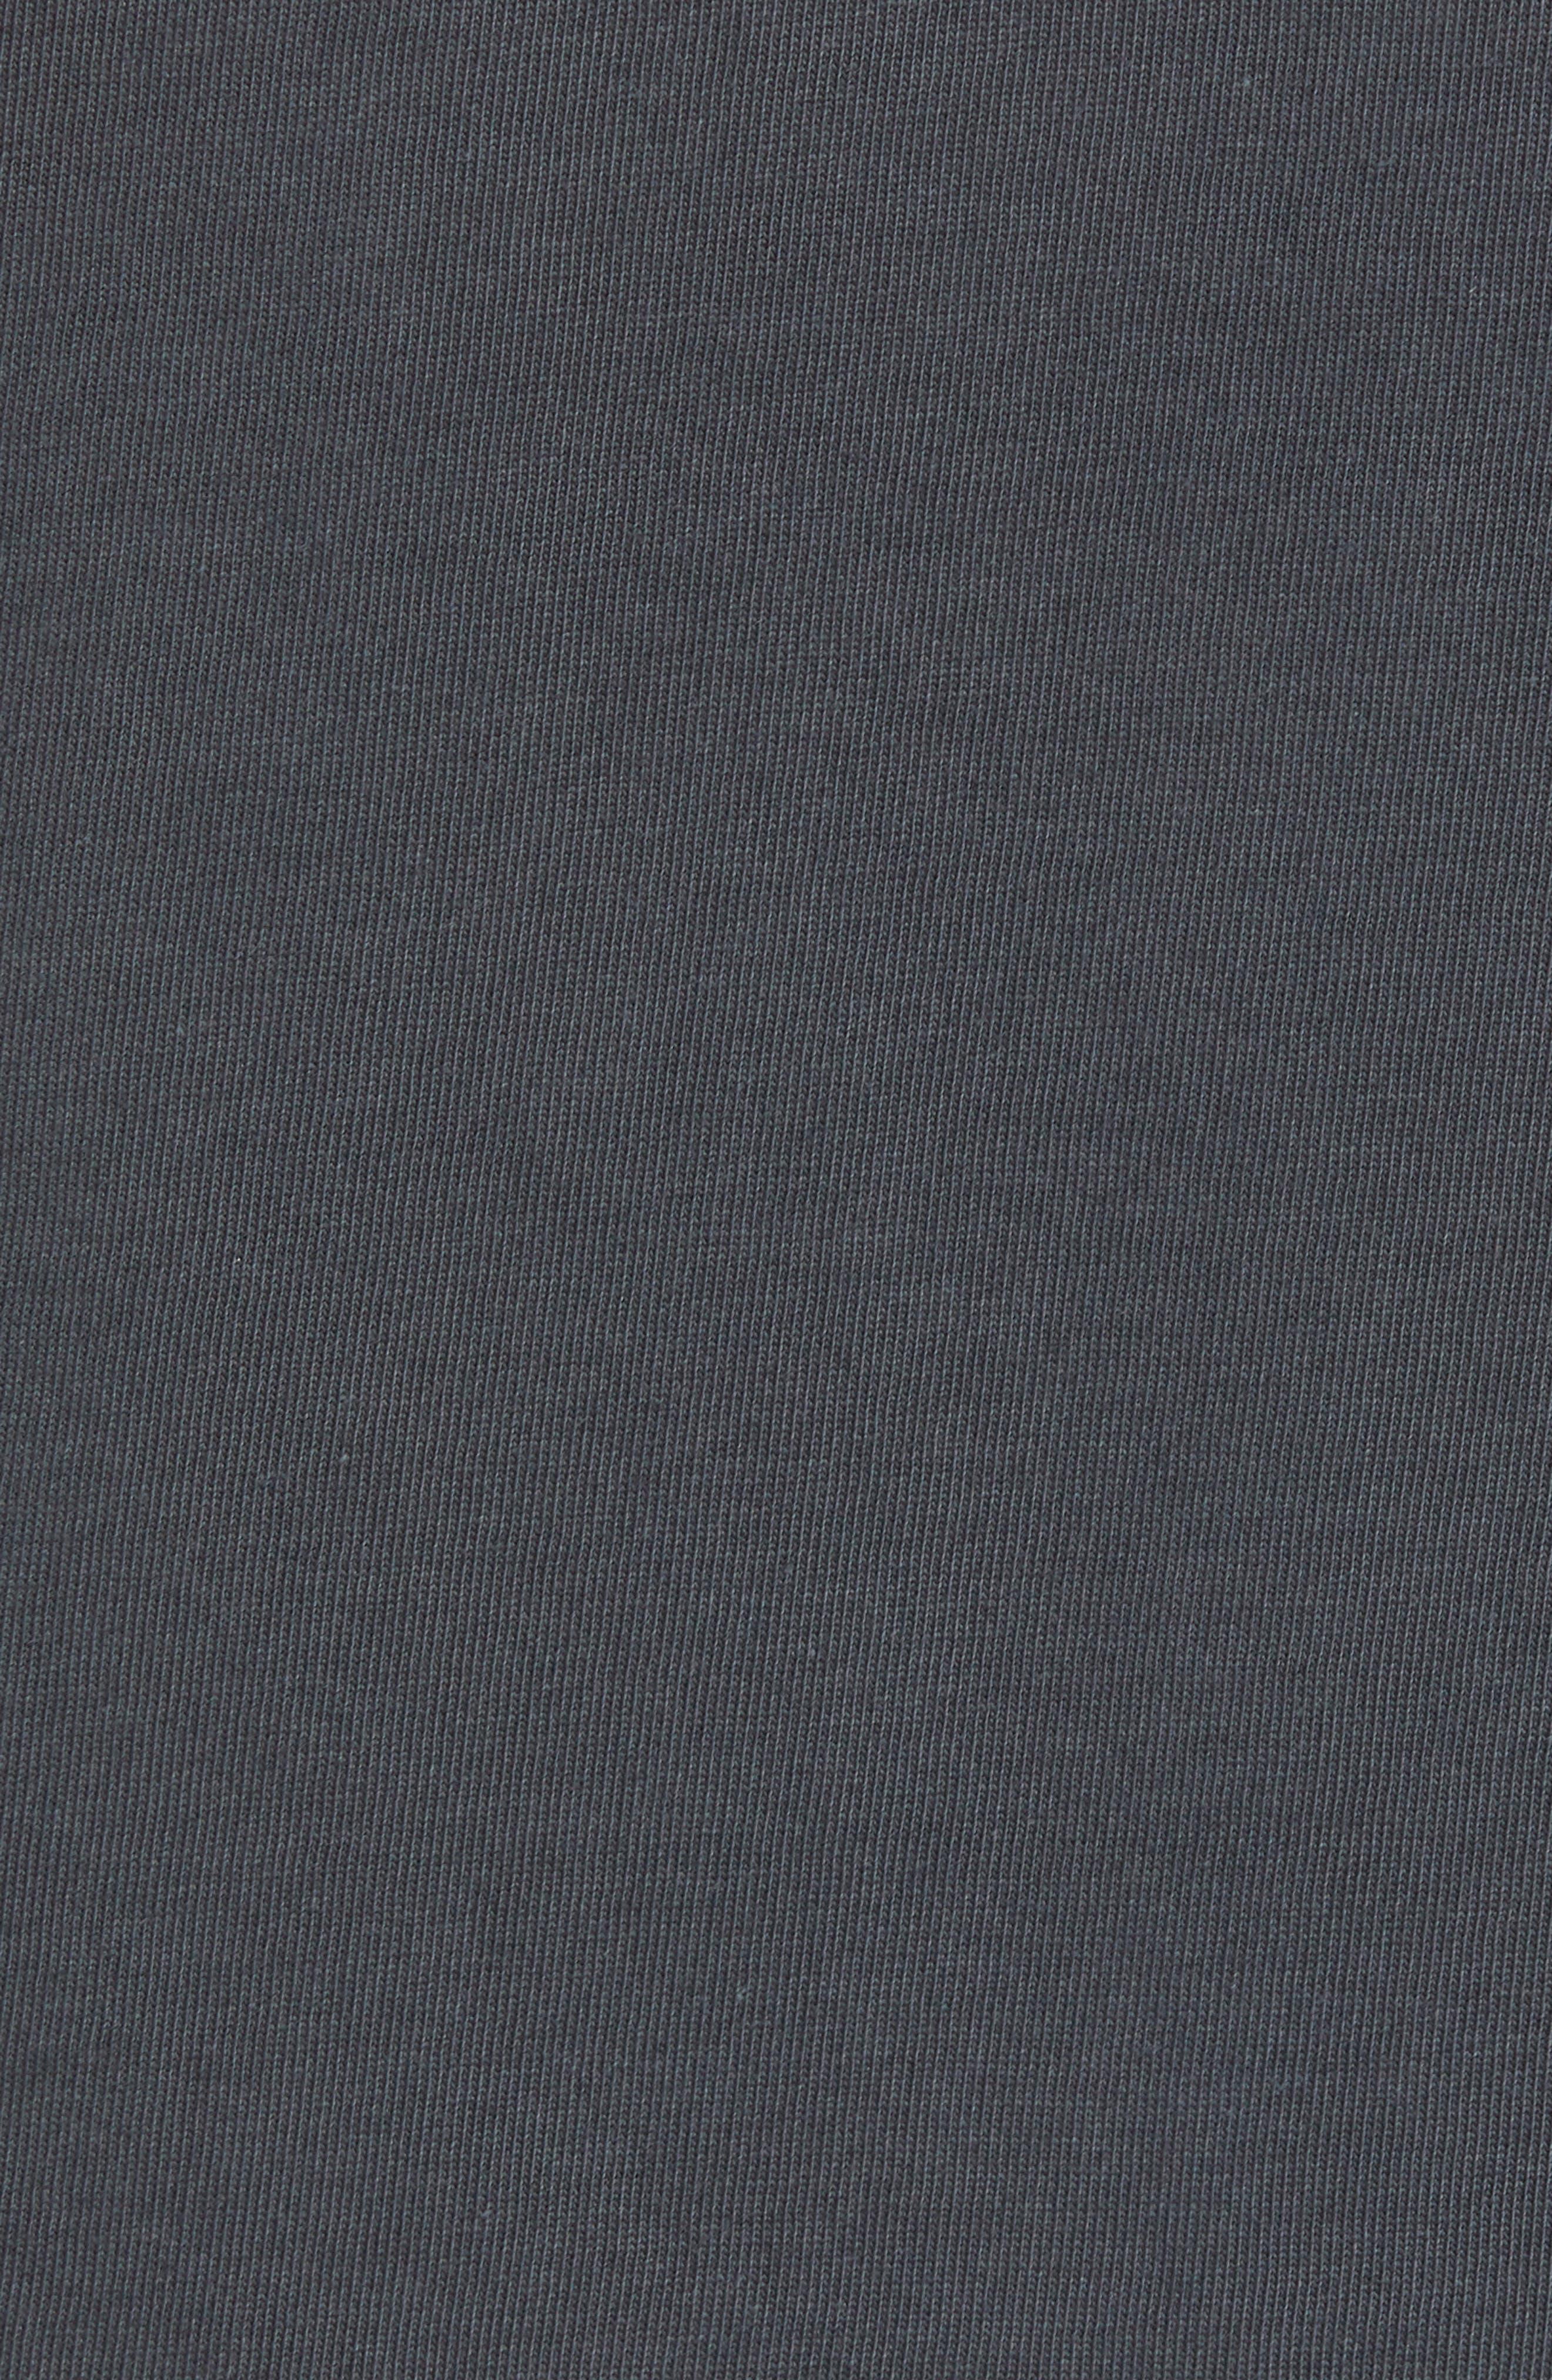 Grill of a Lifetime T-Shirt,                             Alternate thumbnail 5, color,                             Coal